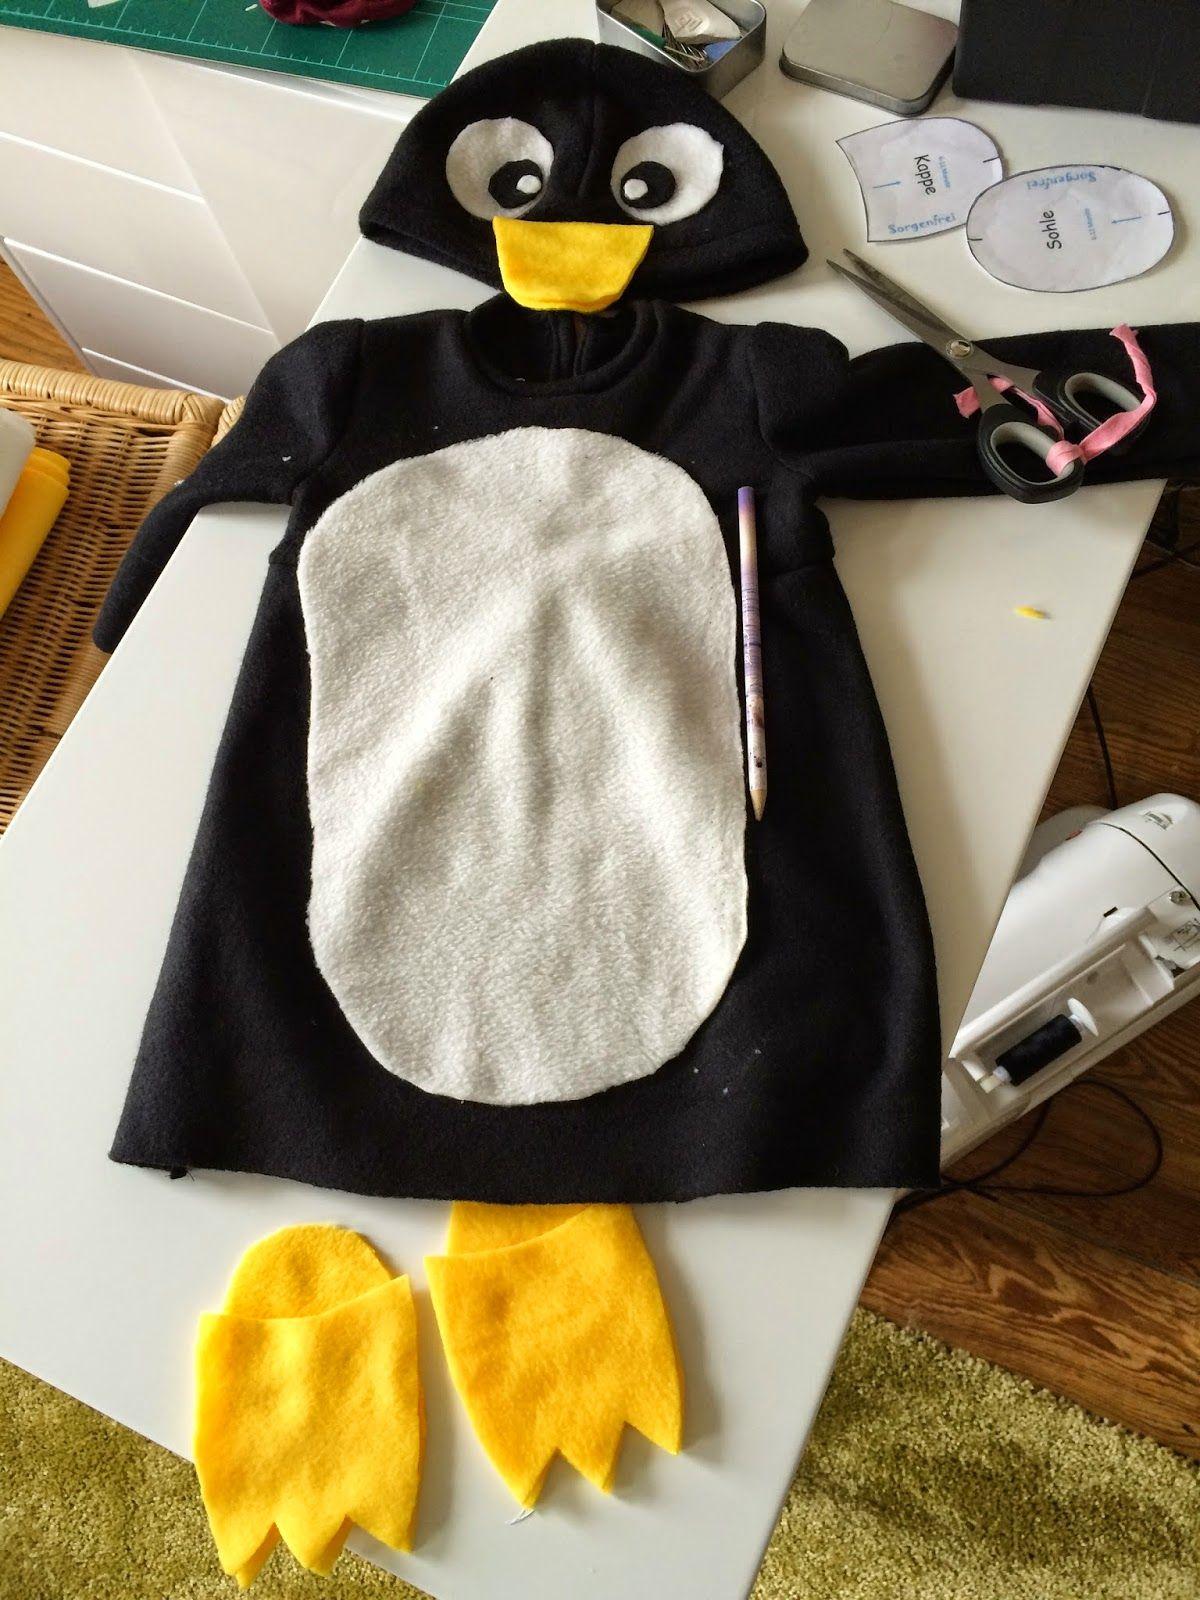 pinguin kost m selber machen pinguine. Black Bedroom Furniture Sets. Home Design Ideas